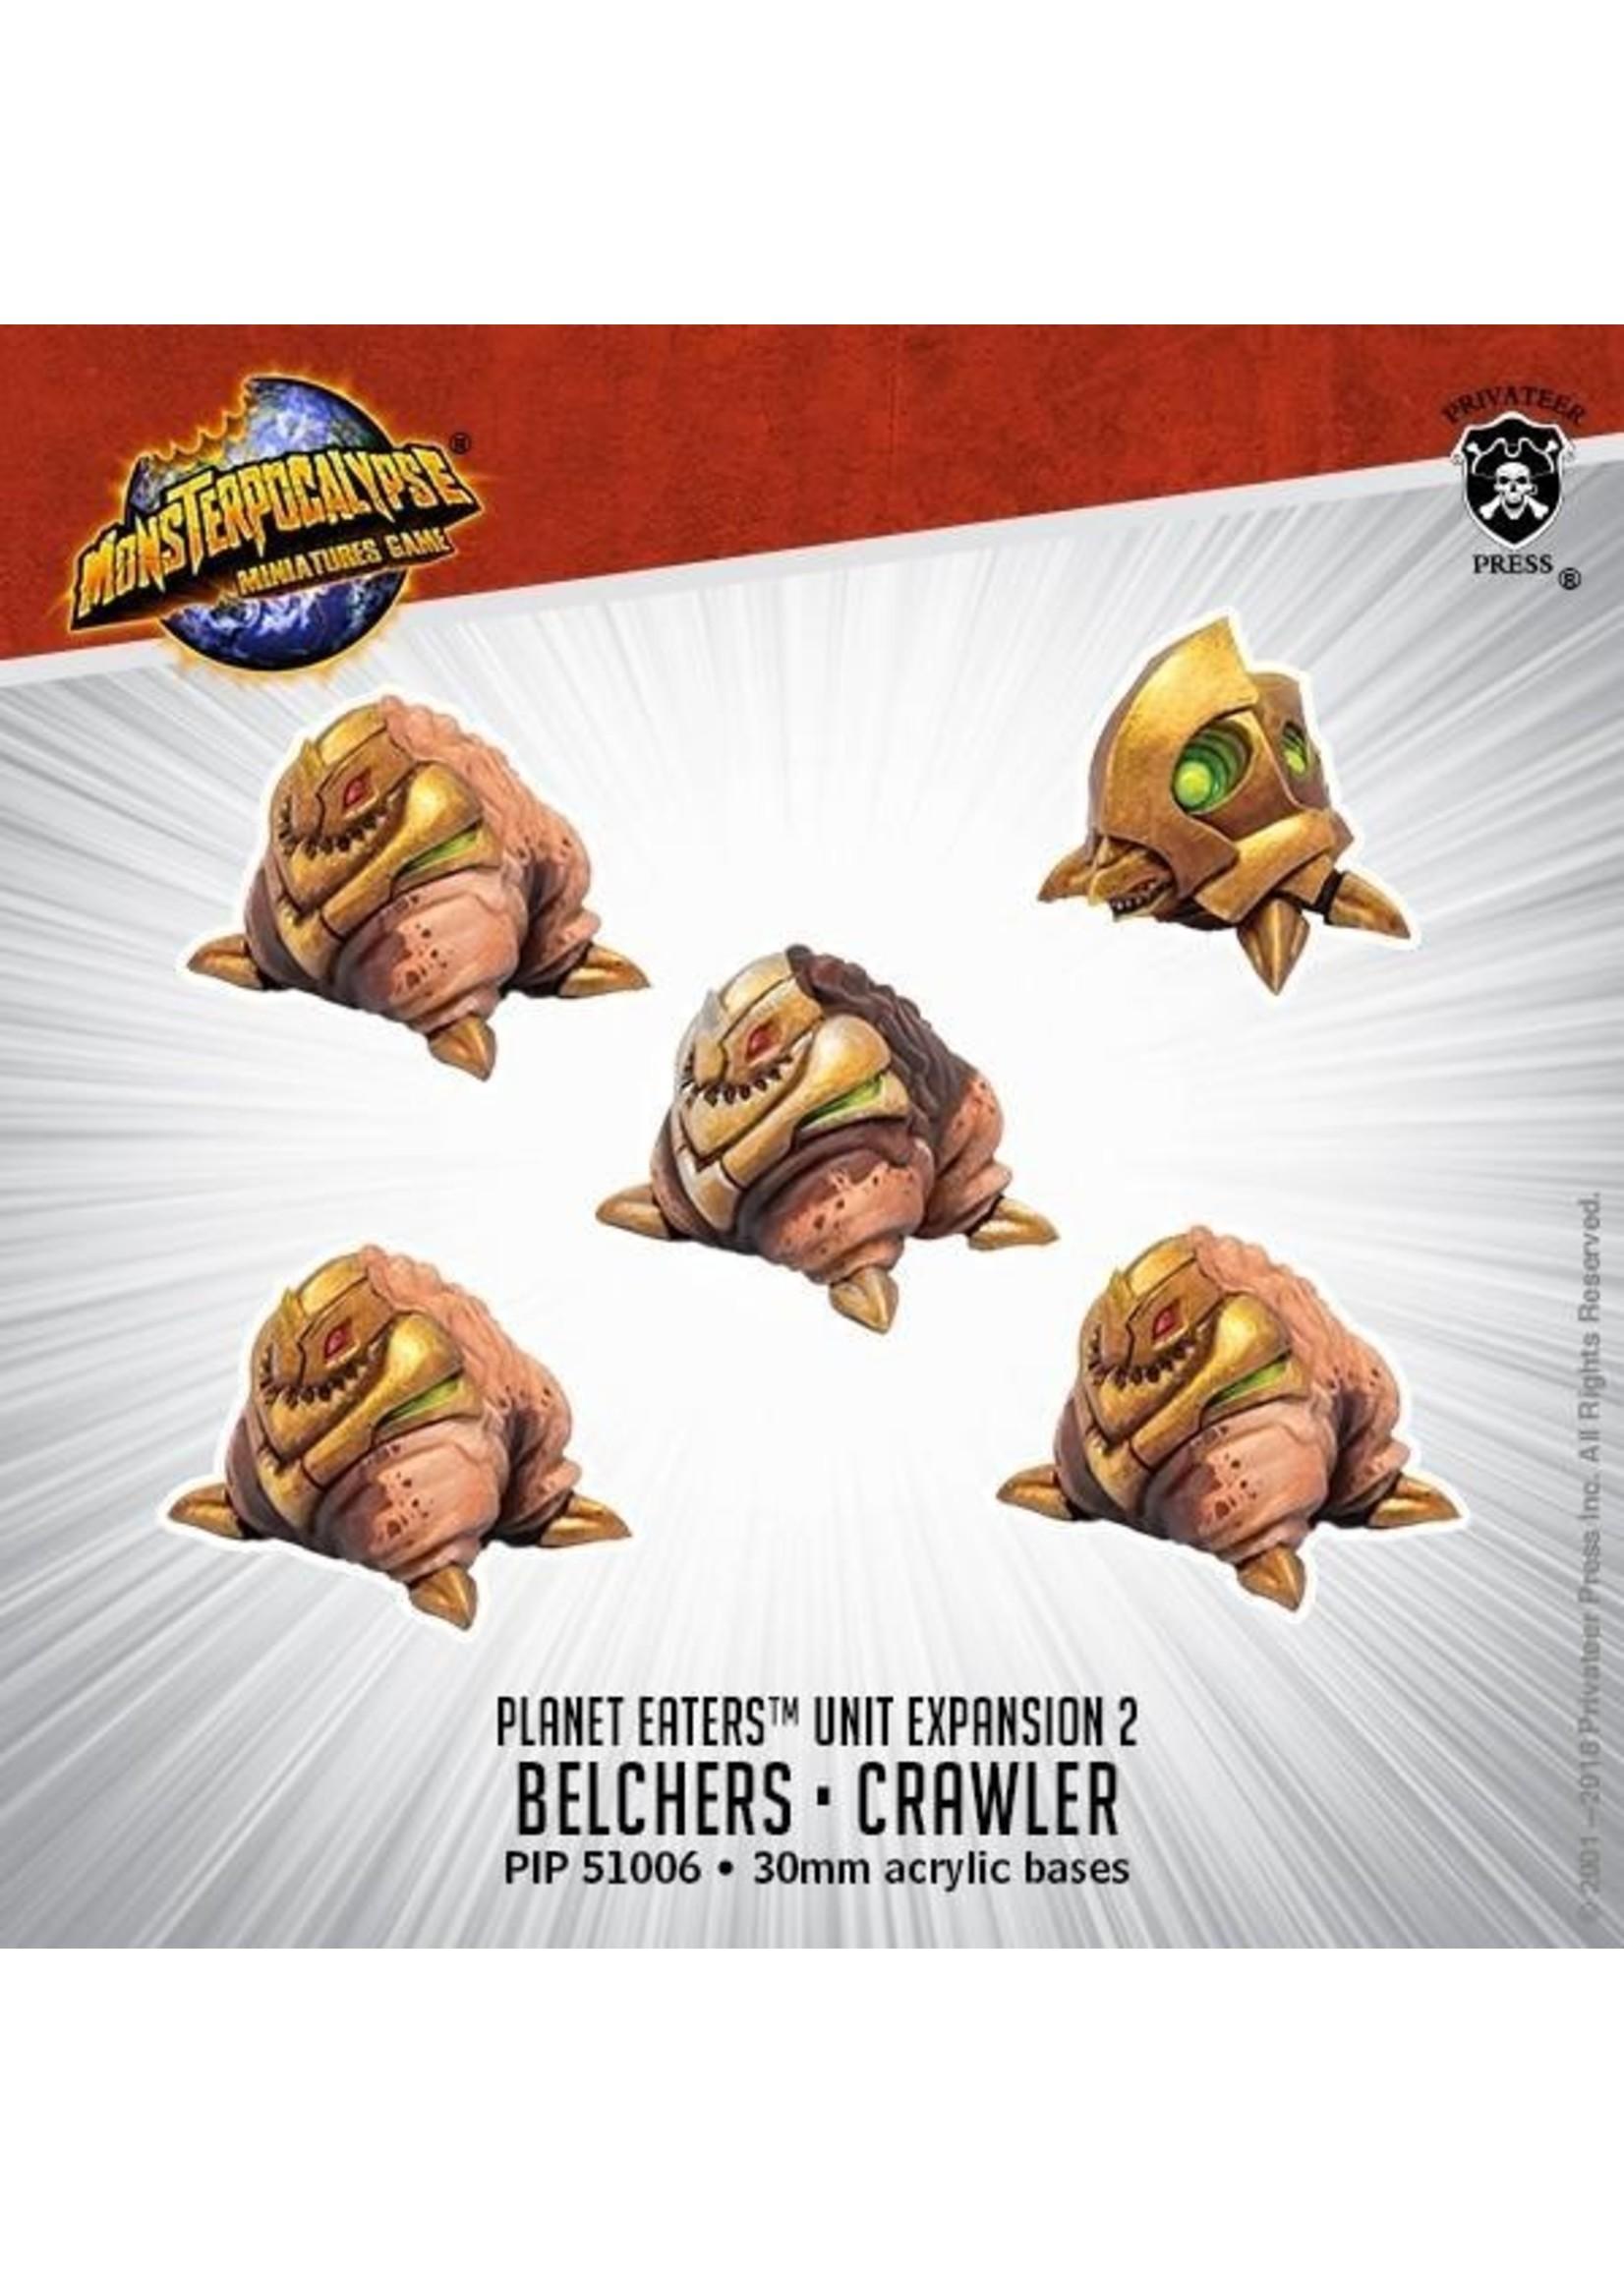 Monsterpocalypse: Planet Eaters Belchers & Crawlers Unit (Resin)